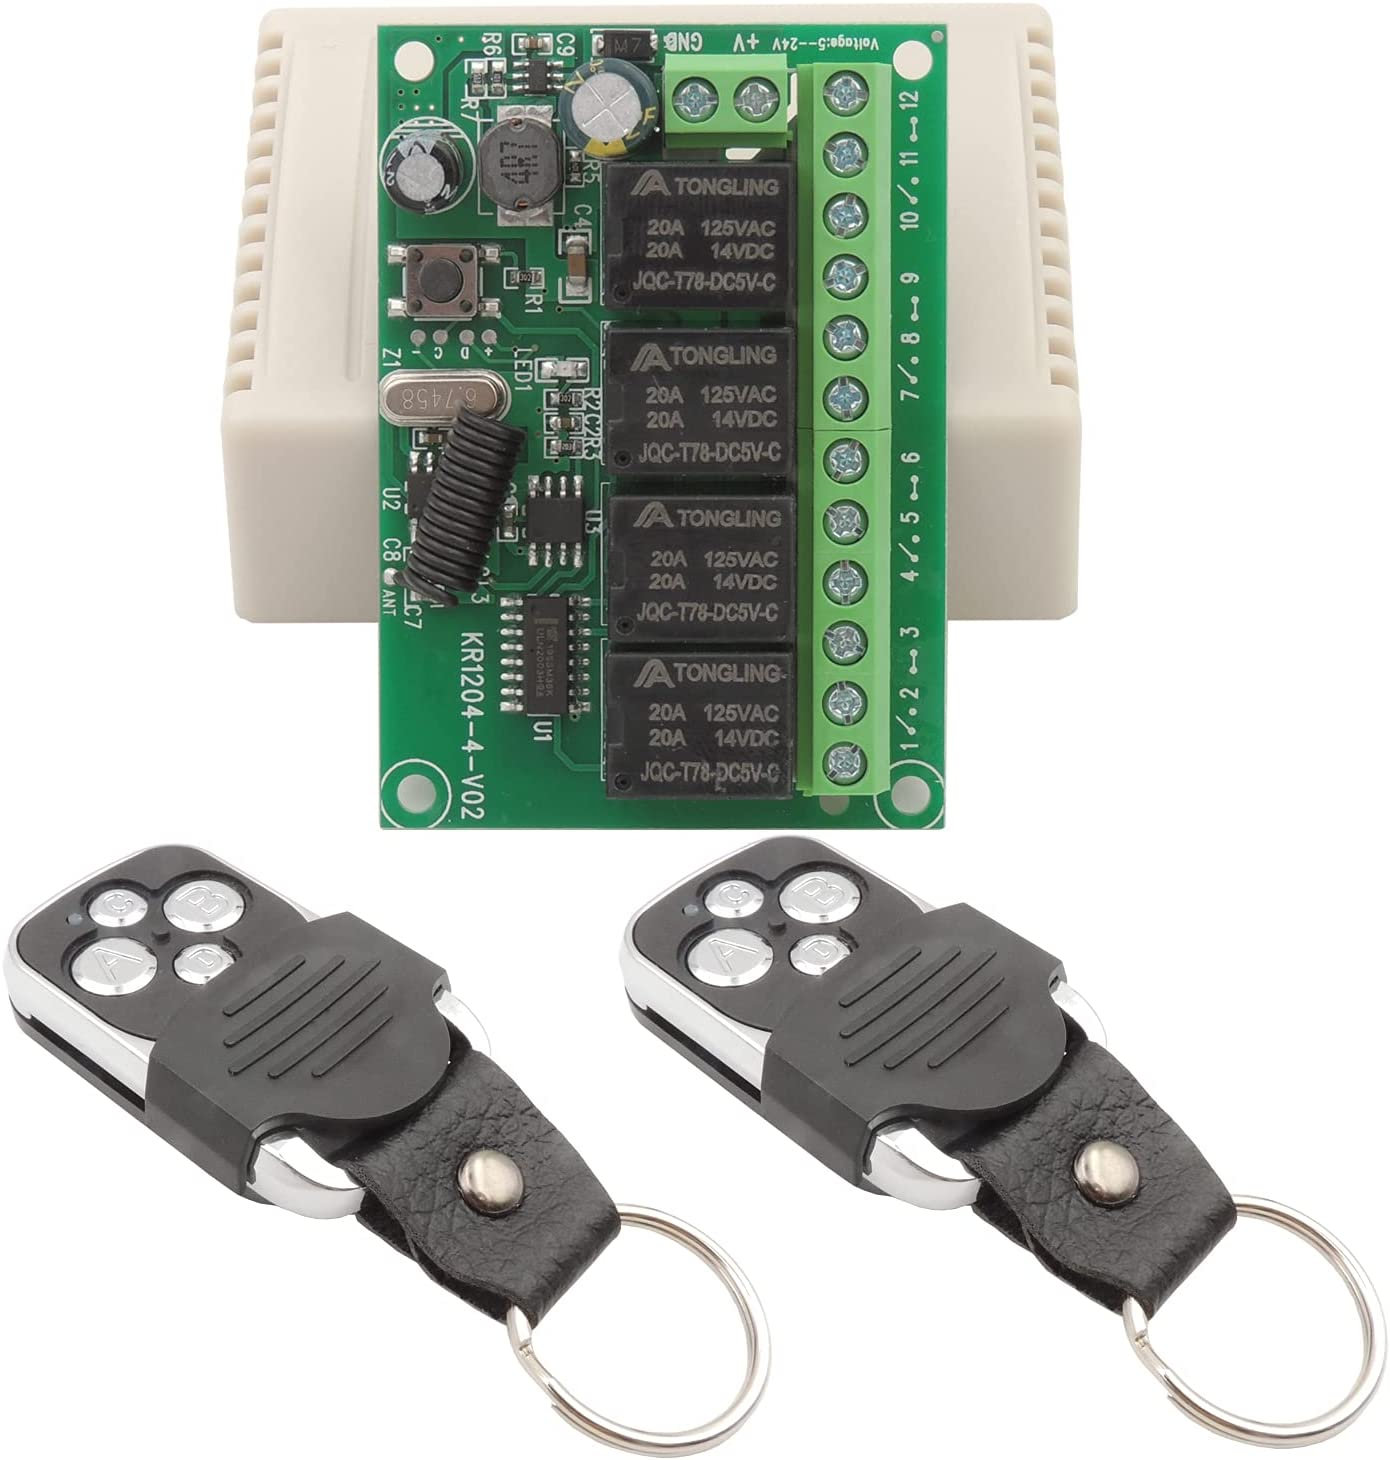 Interruptor de relé inalámbrico 12 V 24 V 4 canales DC 6 – 30 V 433 MHz RF módulo receptor universal 4 CH con 2 transmisores, mando a distancia para luces, puerta de garaje, motor, bricolaje